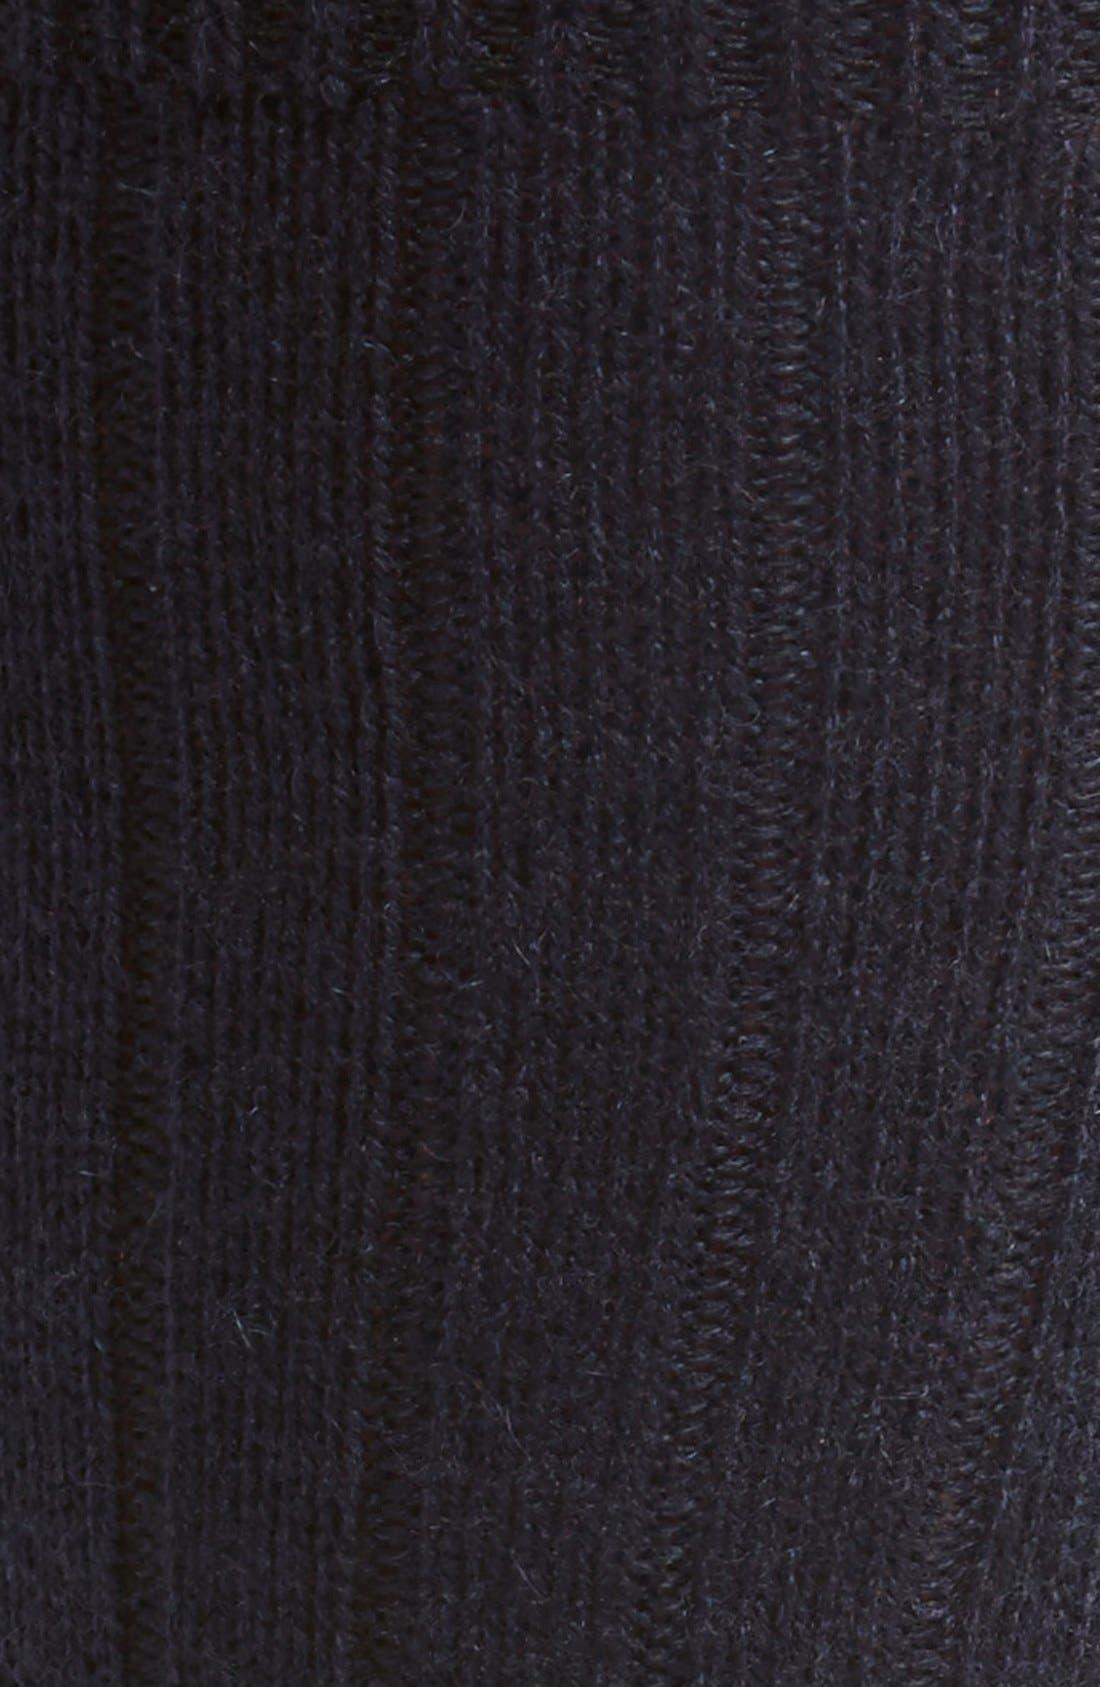 'Waddington' Cashmere Blend Mid Calf Socks,                             Alternate thumbnail 20, color,